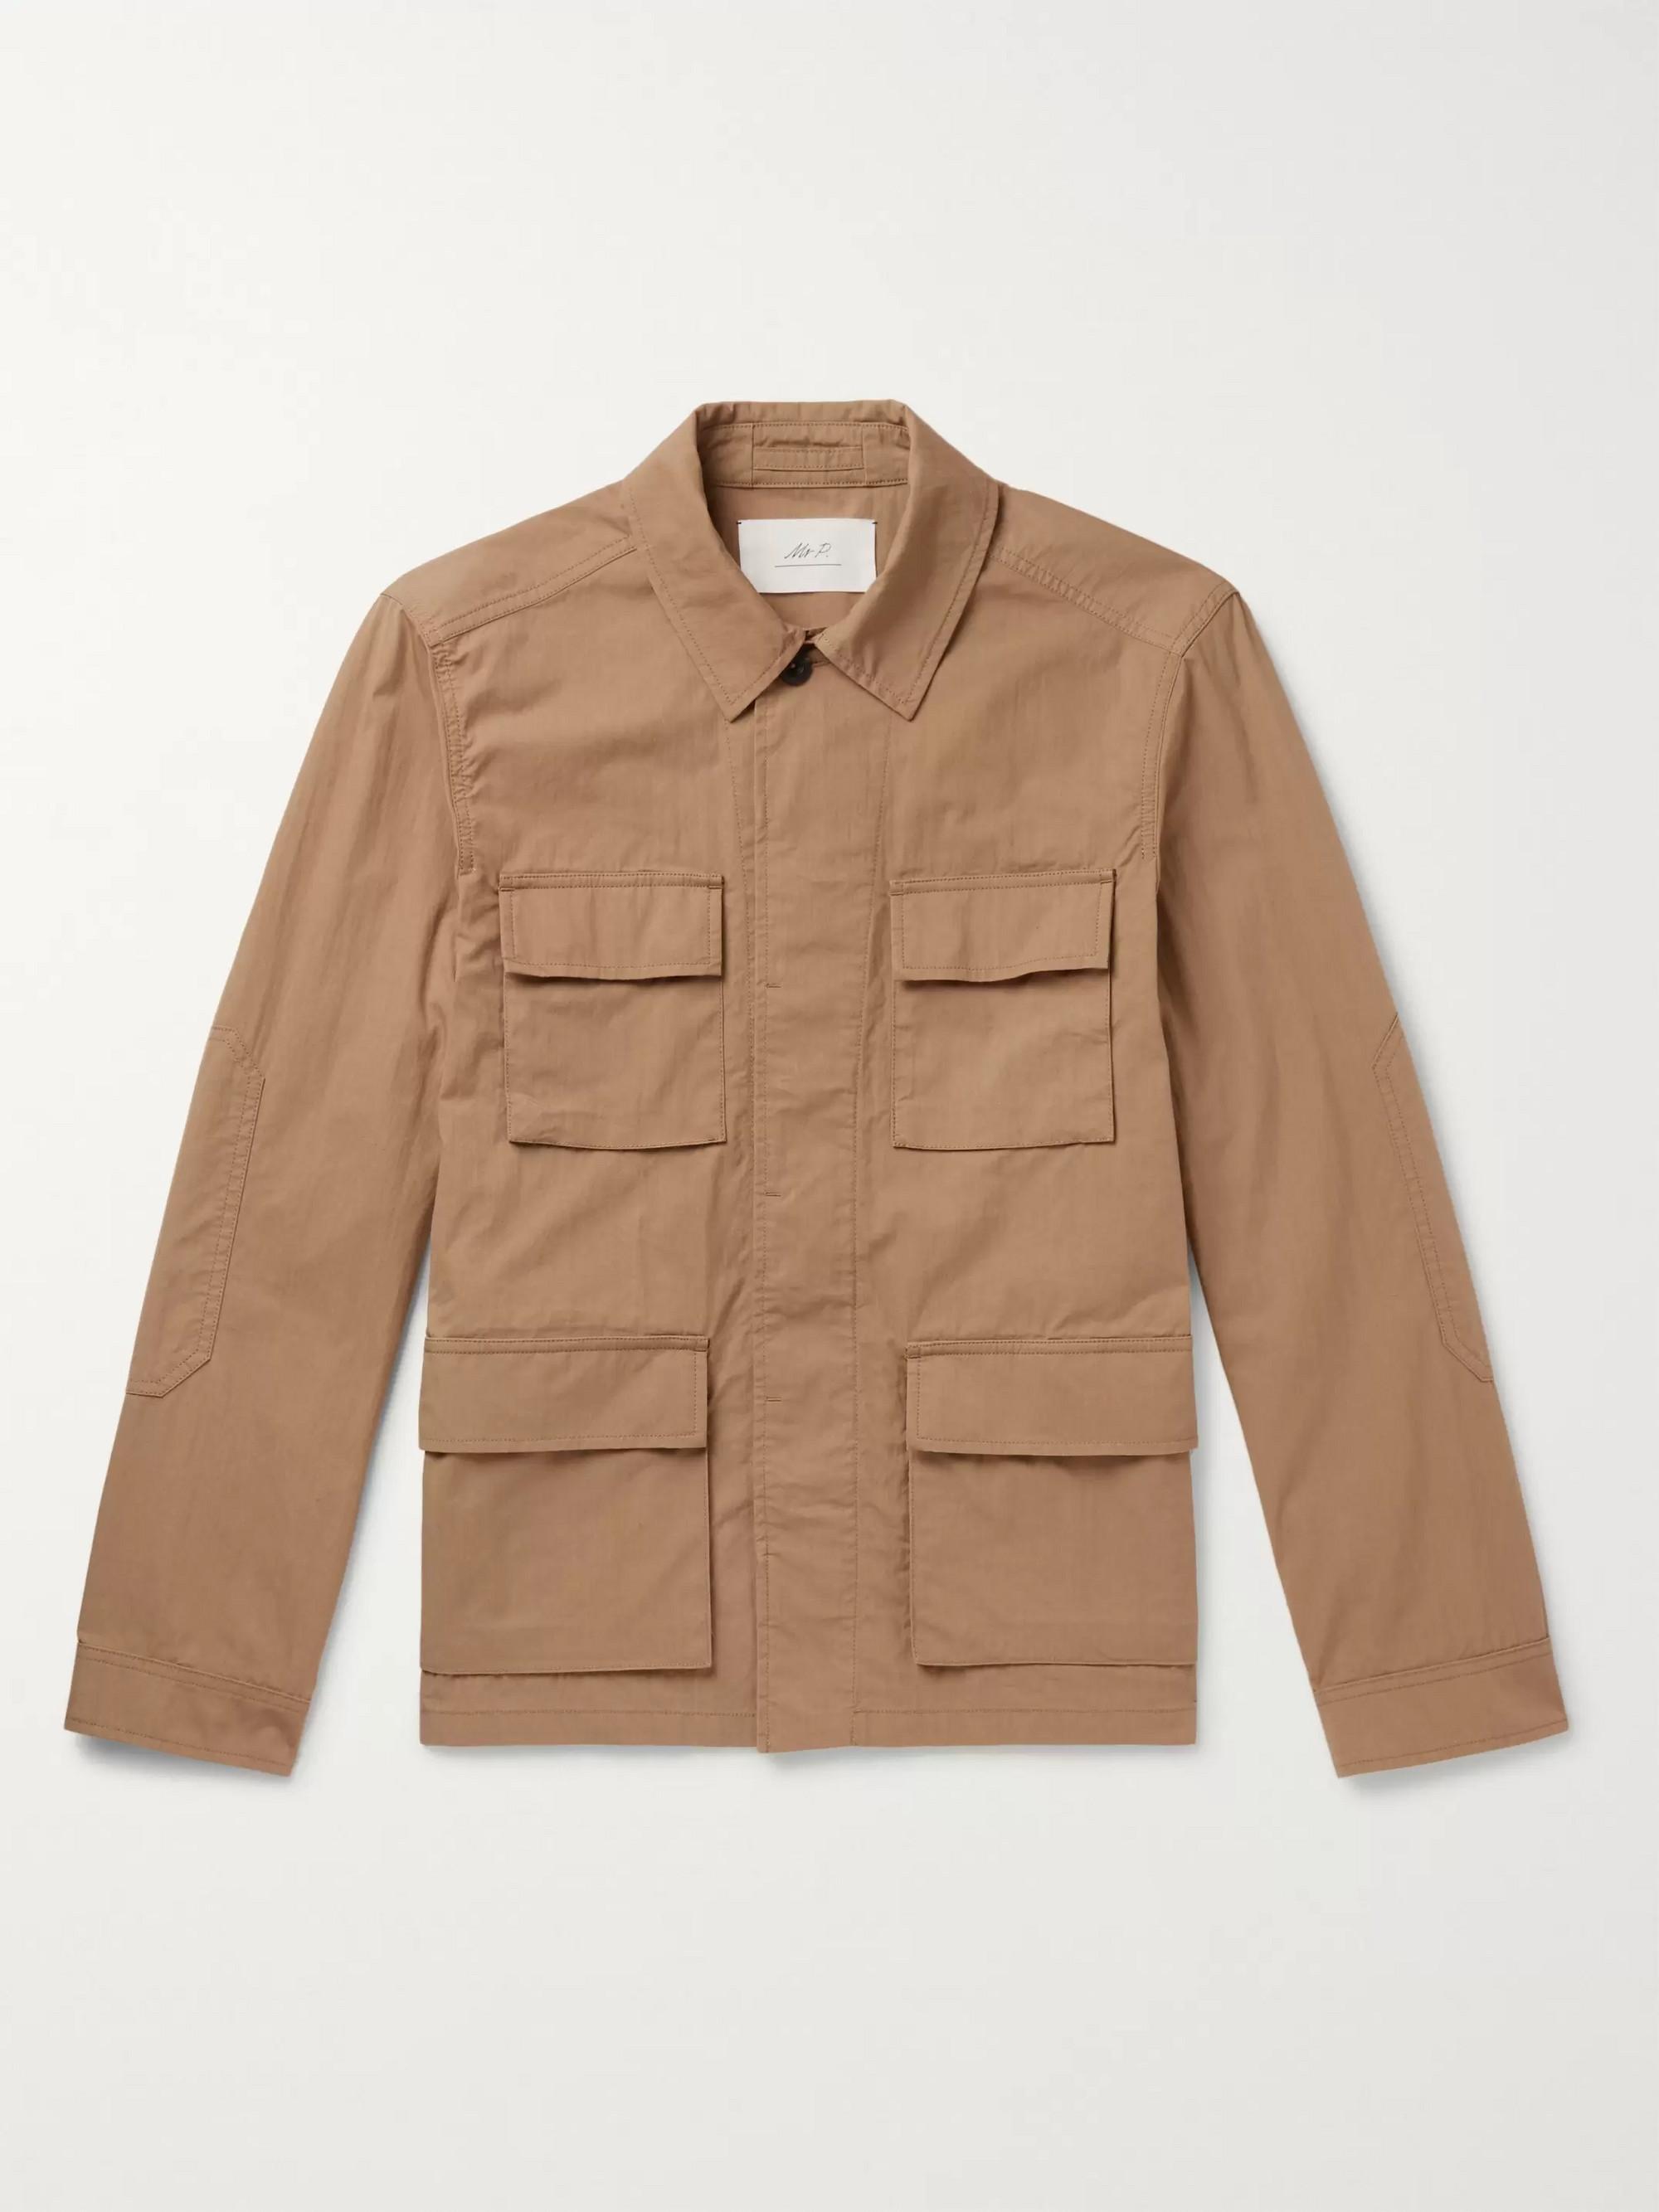 Mr P. Cotton and Nylon-Blend Field Jacket